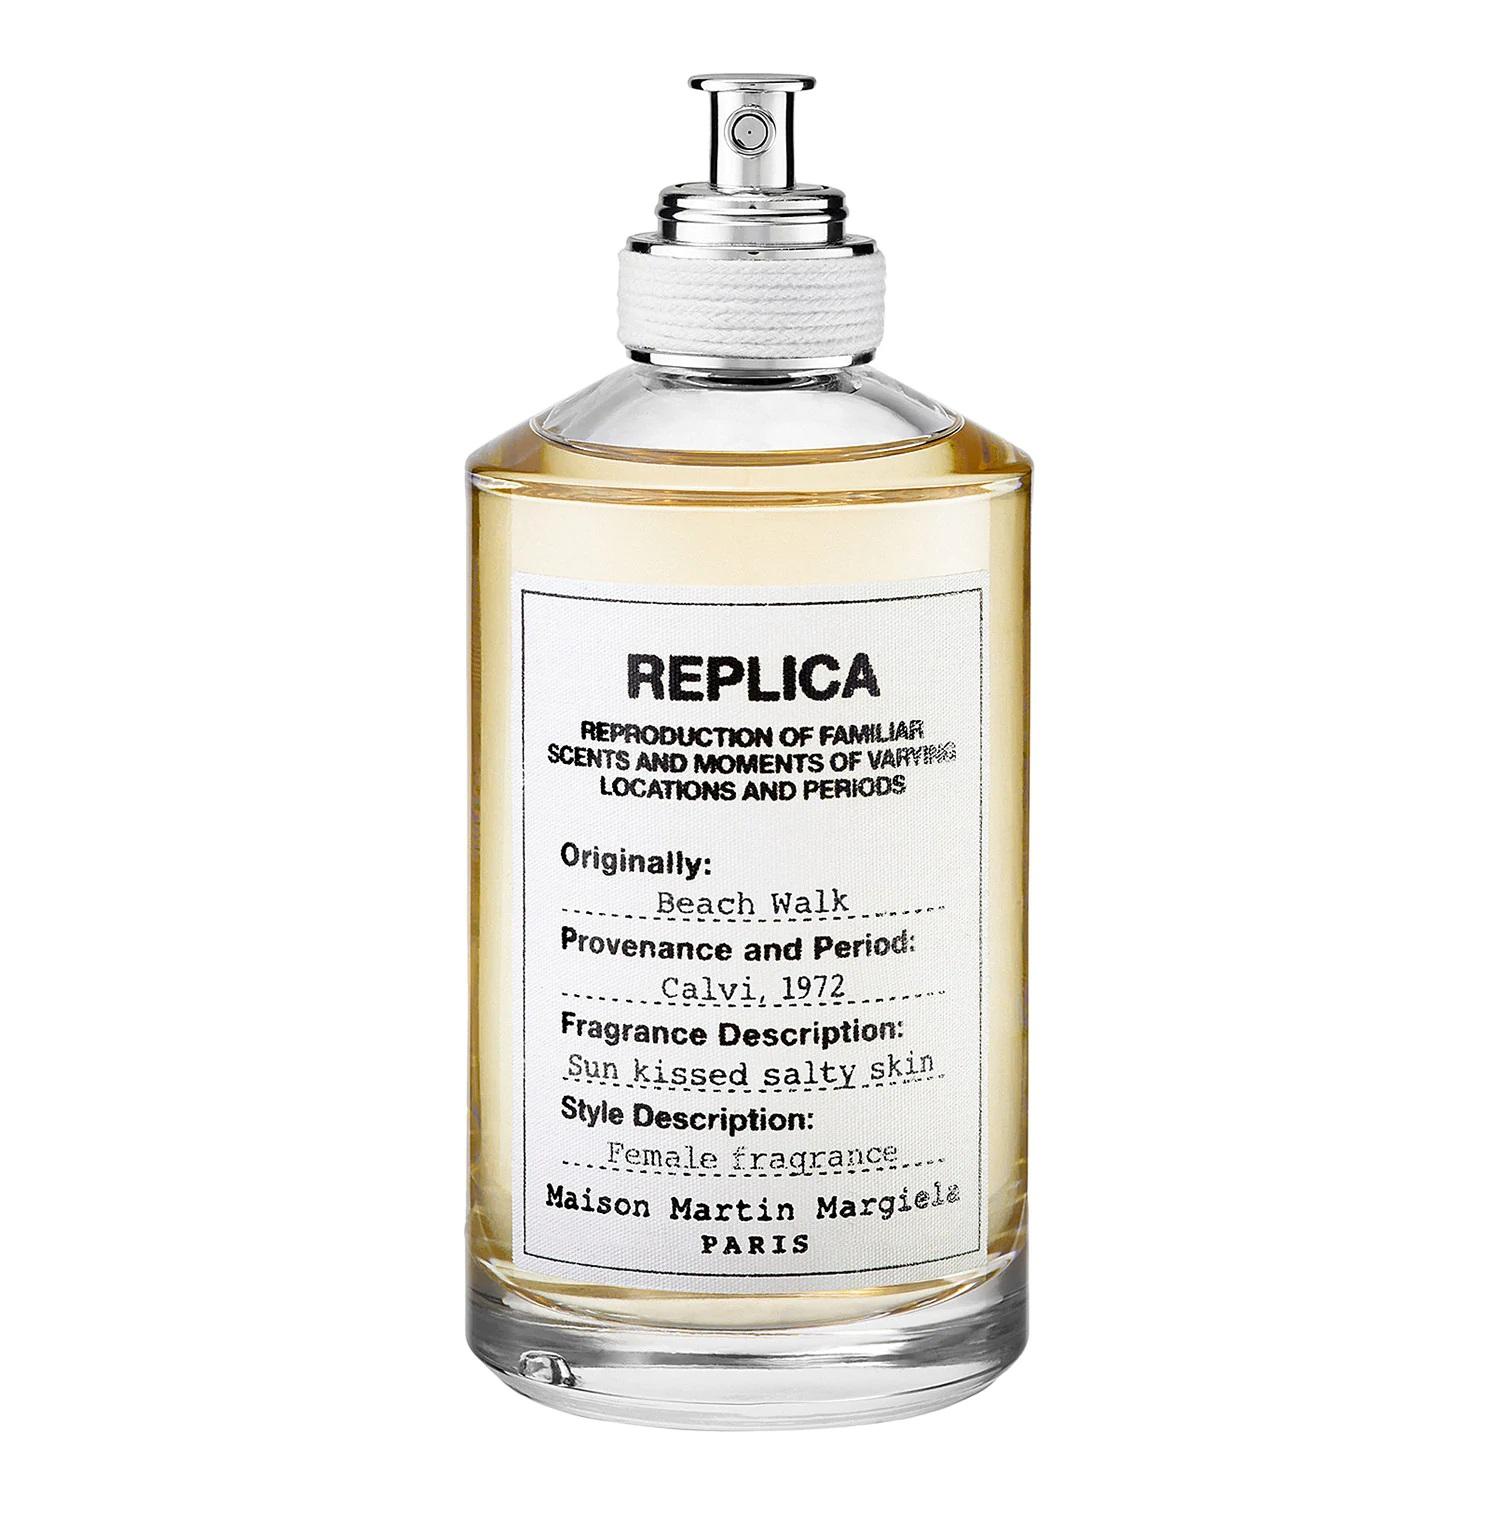 Perfume Replica Beach Walk de Maison Martin Margiela